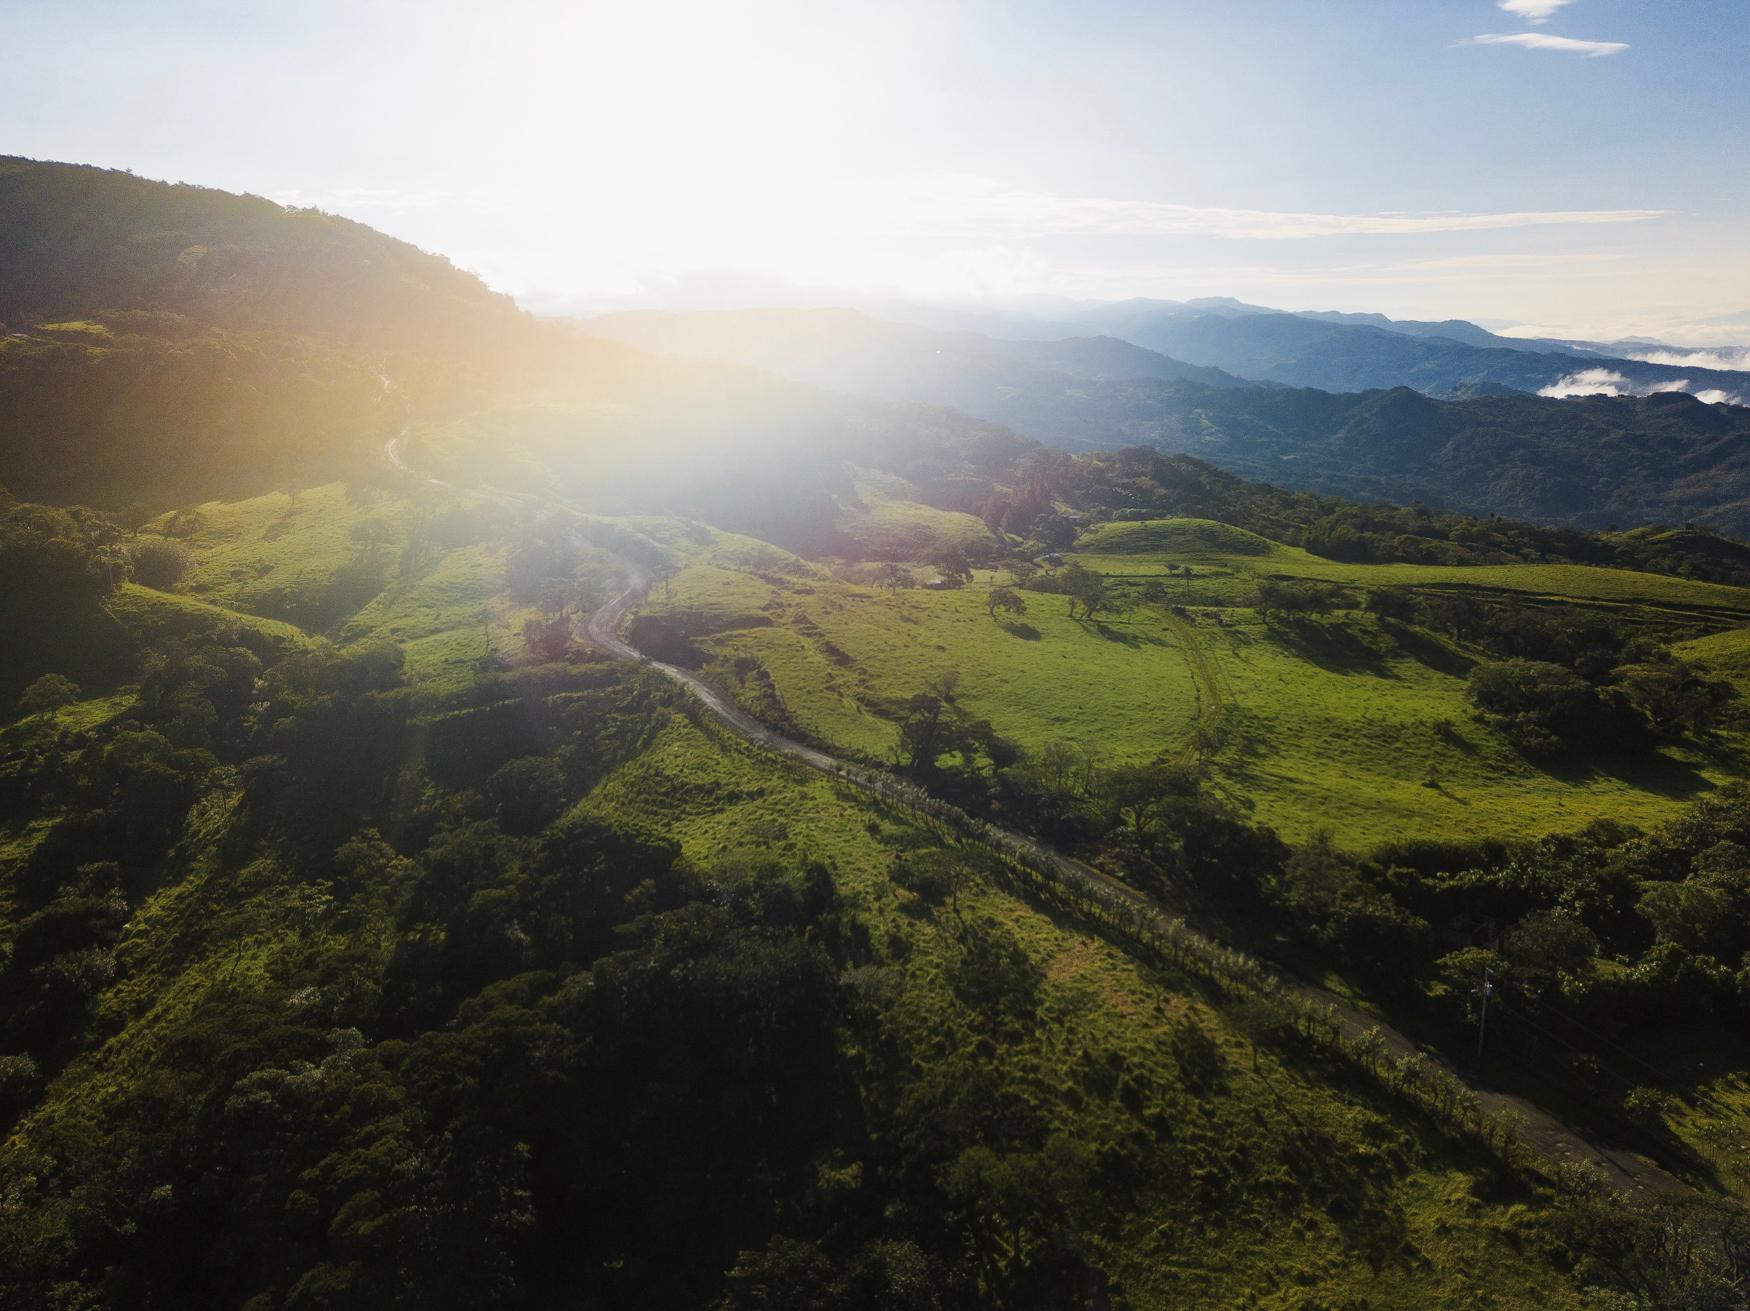 VidaMountain-YogaRetreat-Drone-Photography-Costa-Rica